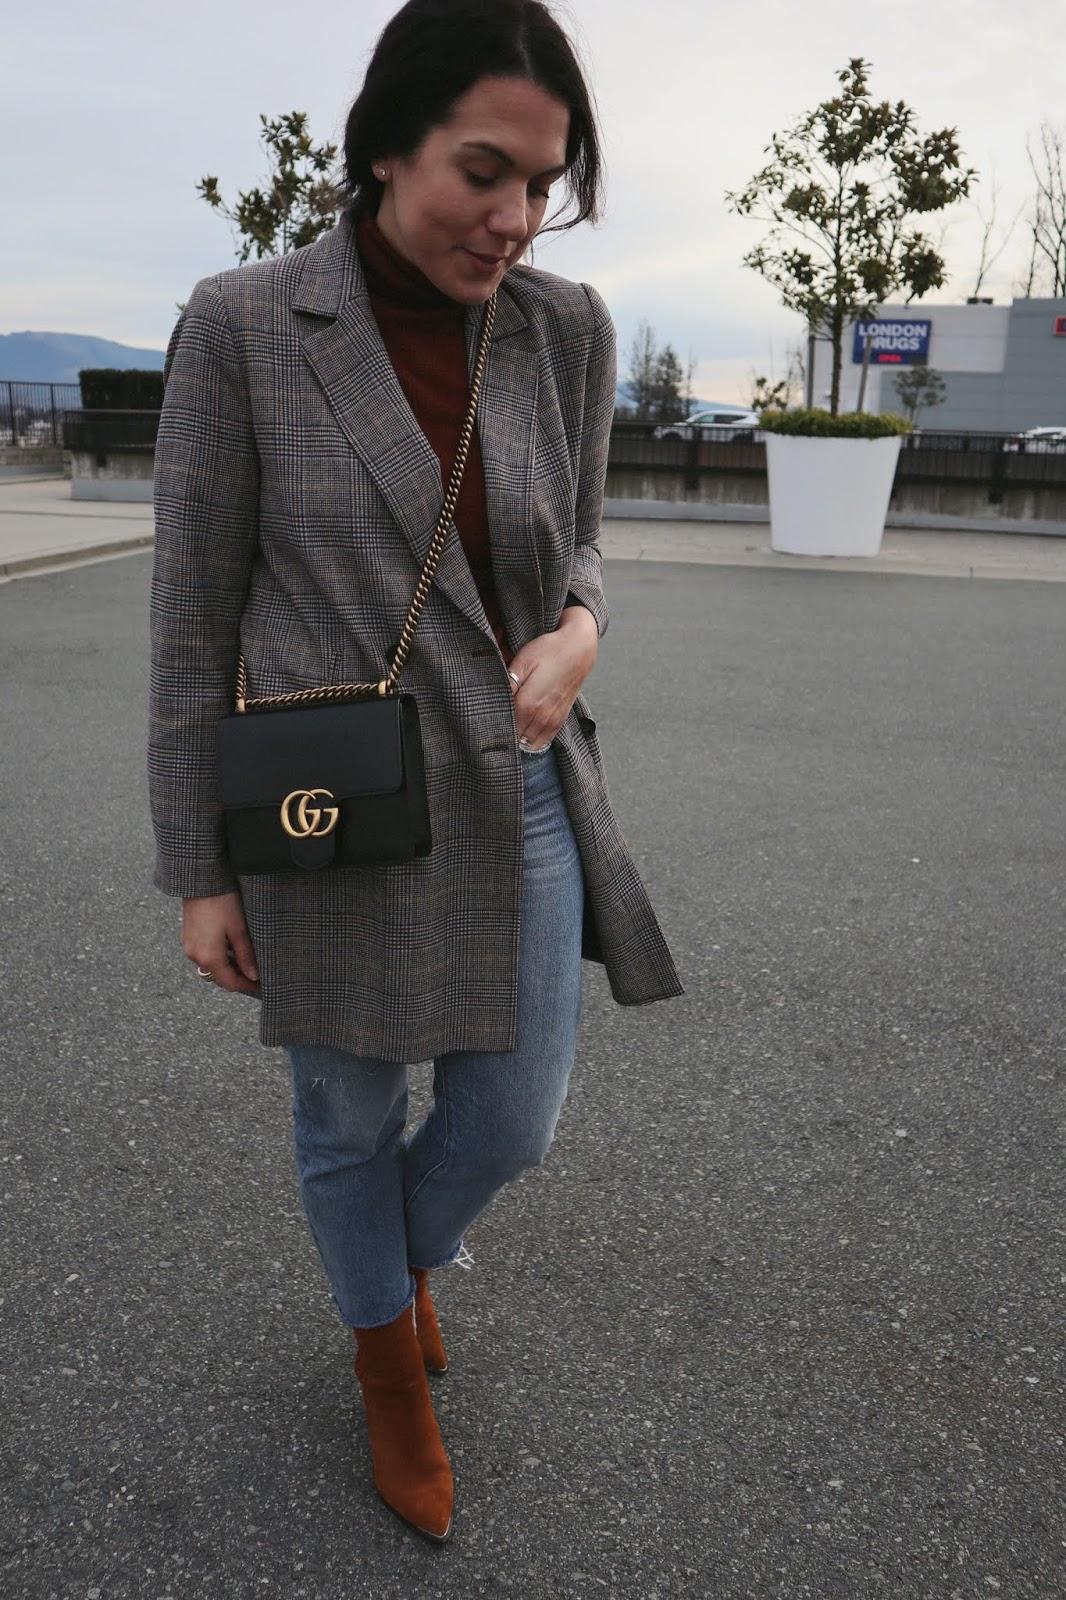 plaid blazer outfit zara levis wedgie jeans jonak suede boots vancouver fashion blogger